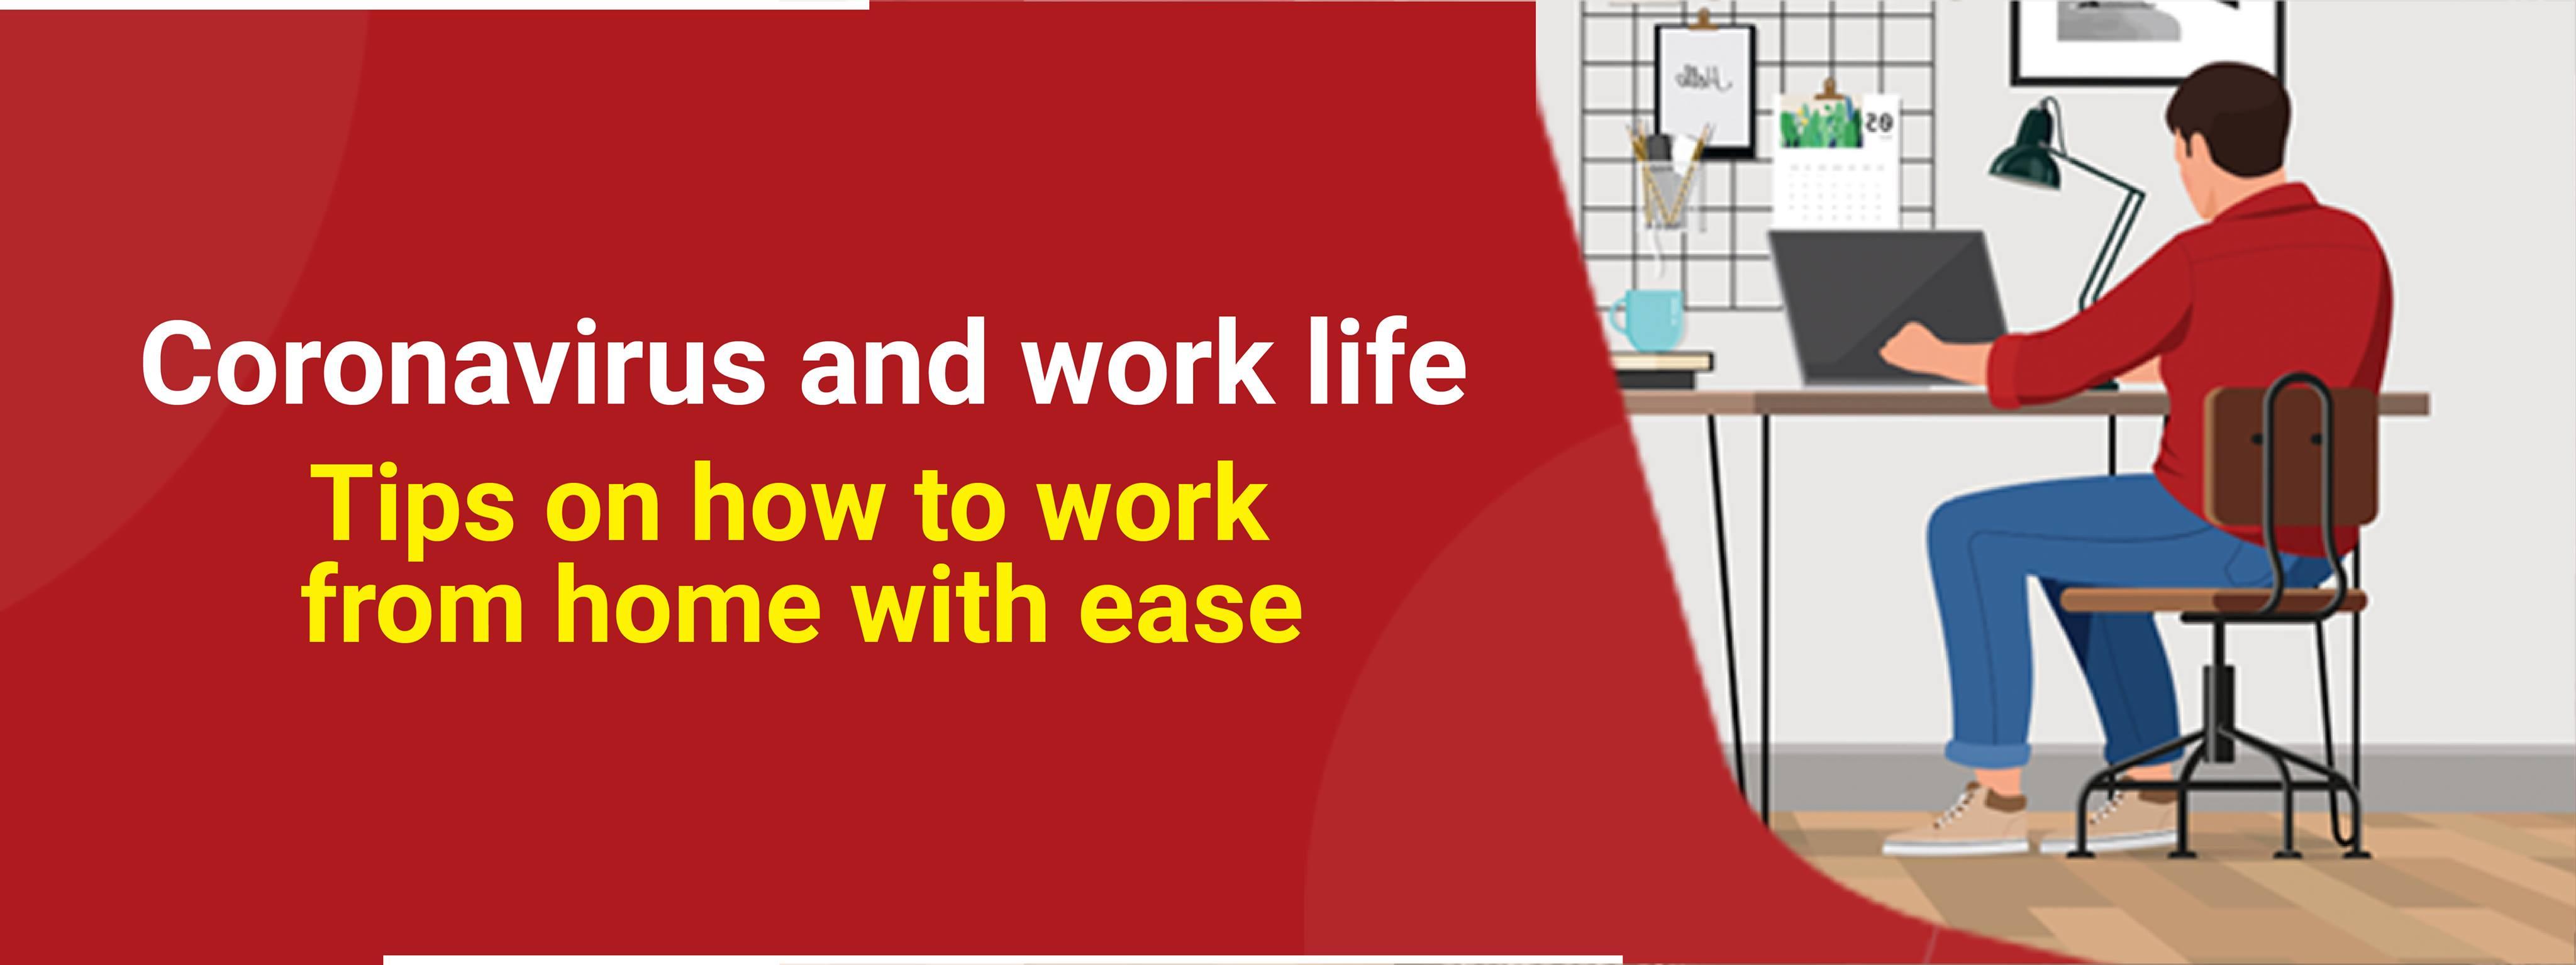 Corona virus and work life